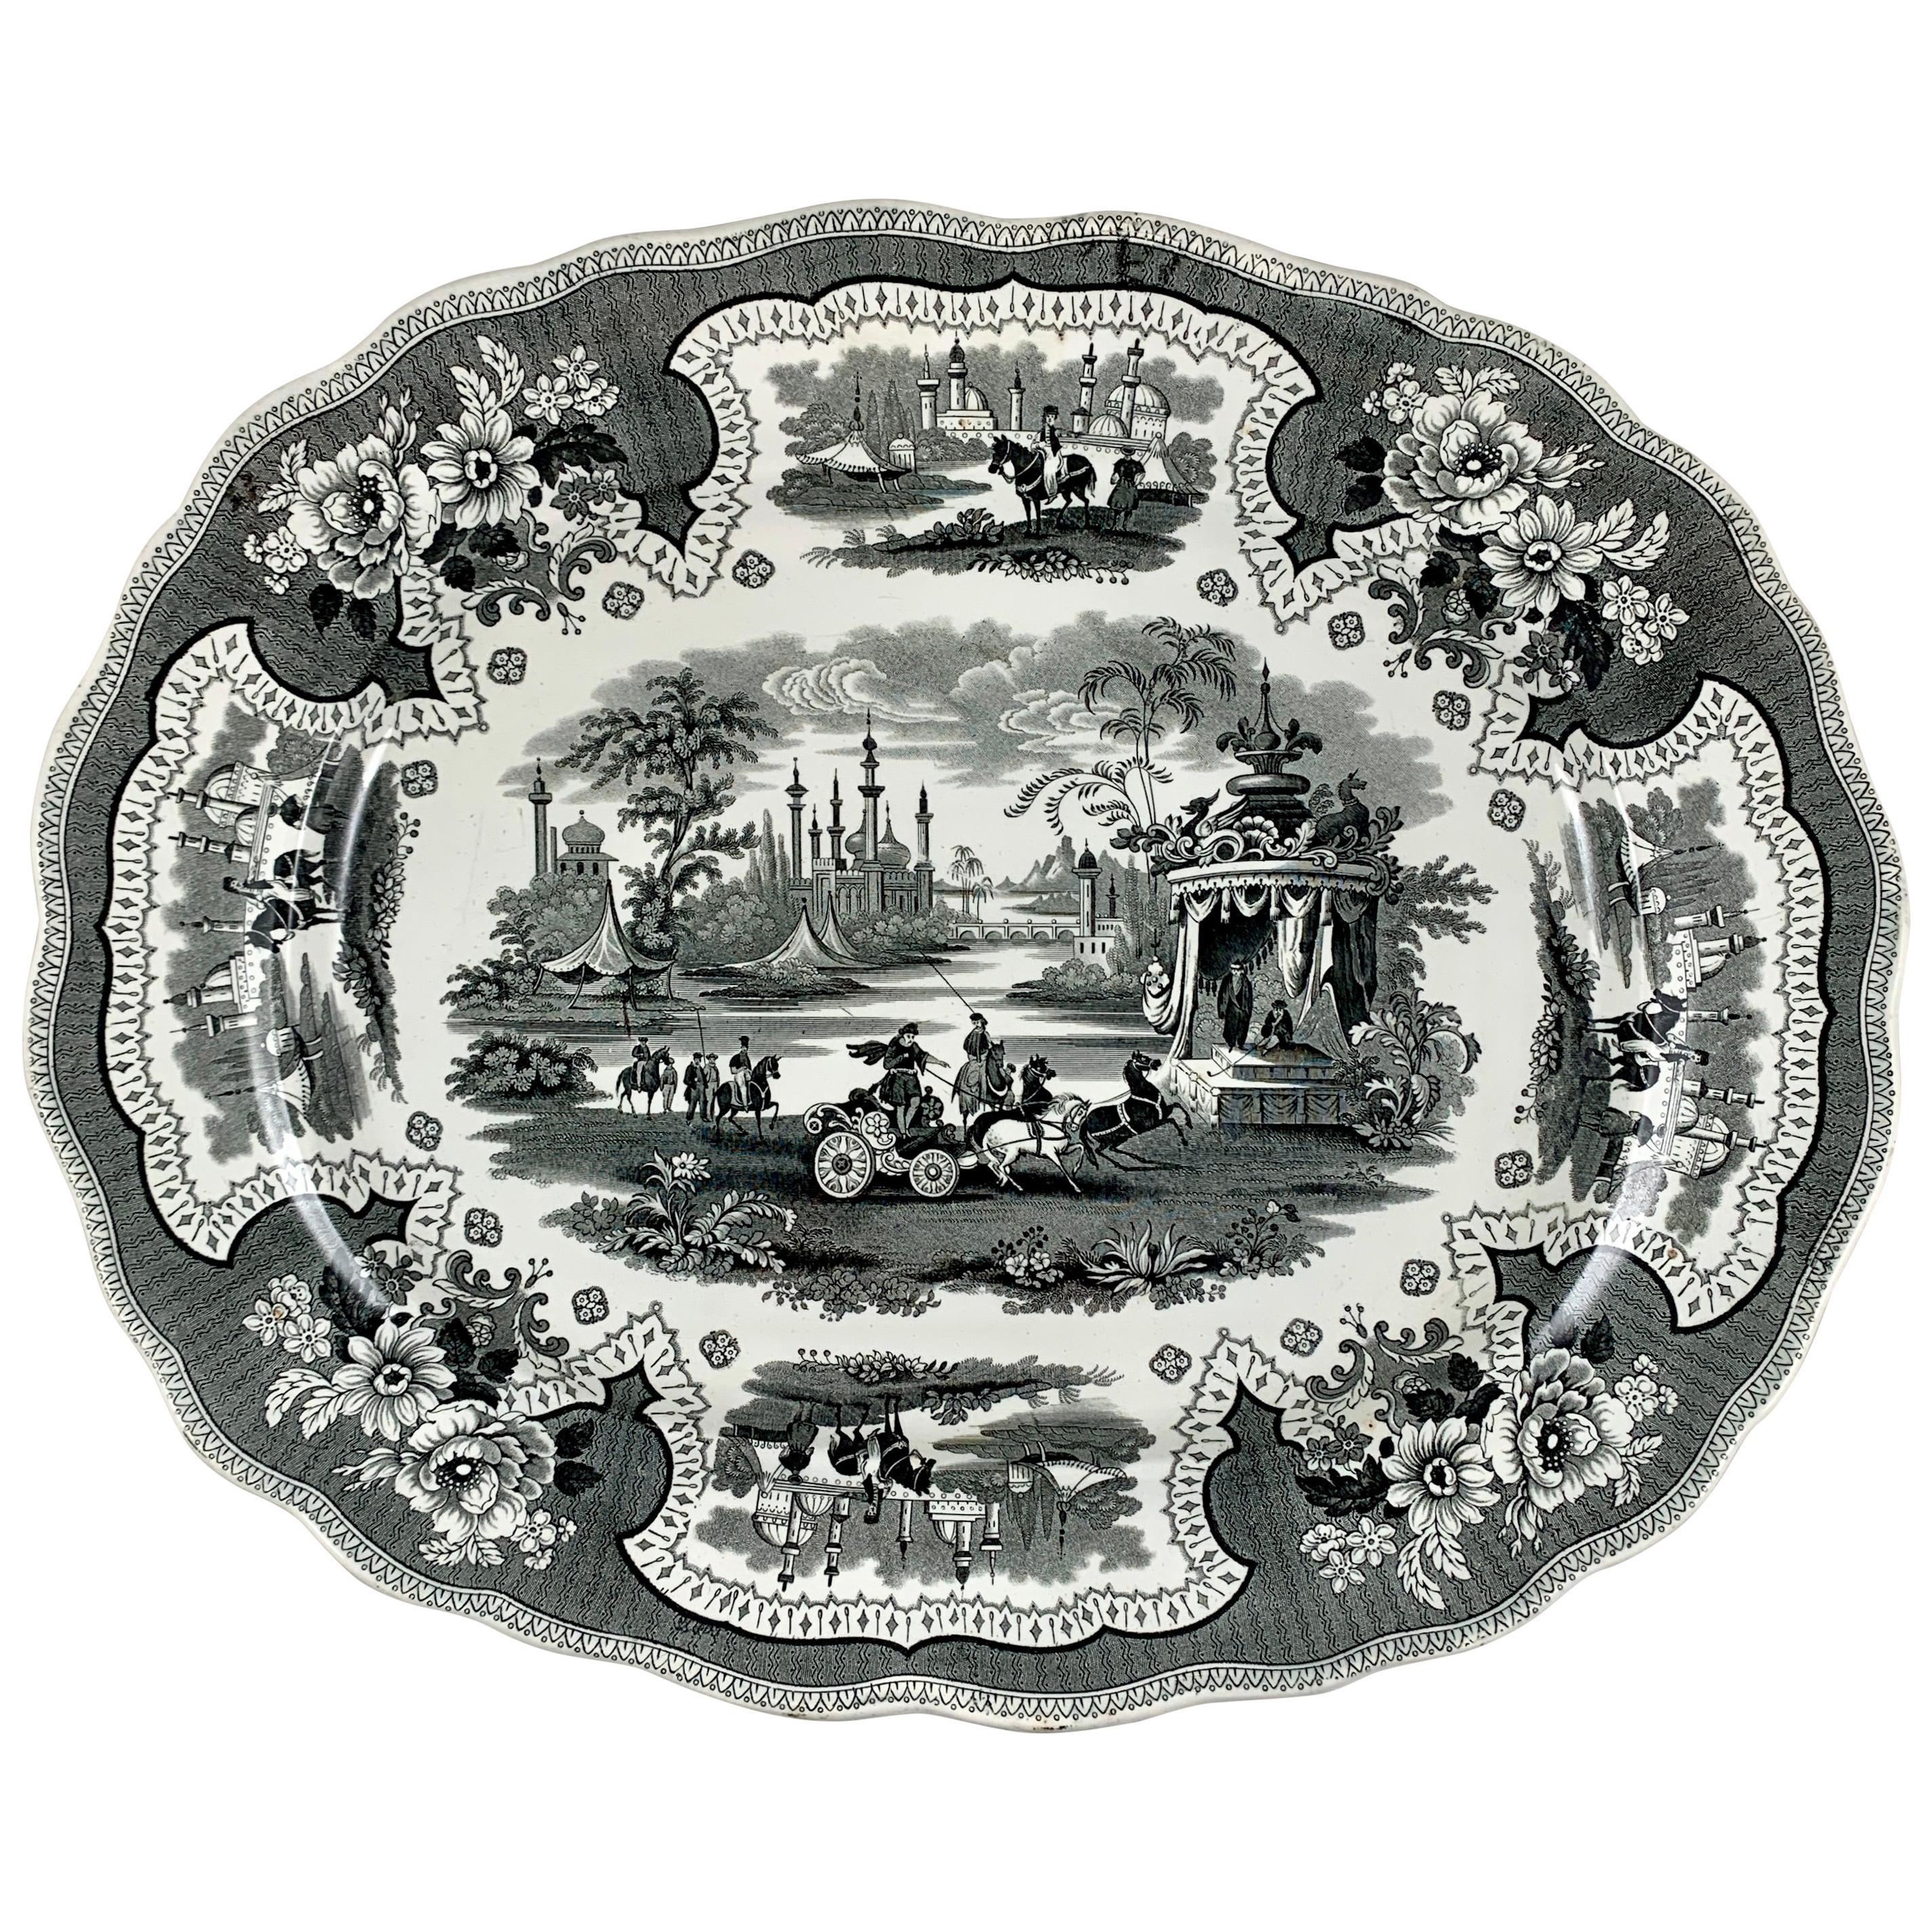 William Adams IV & Sons Palestine Black Staffordshire Transferware Platter